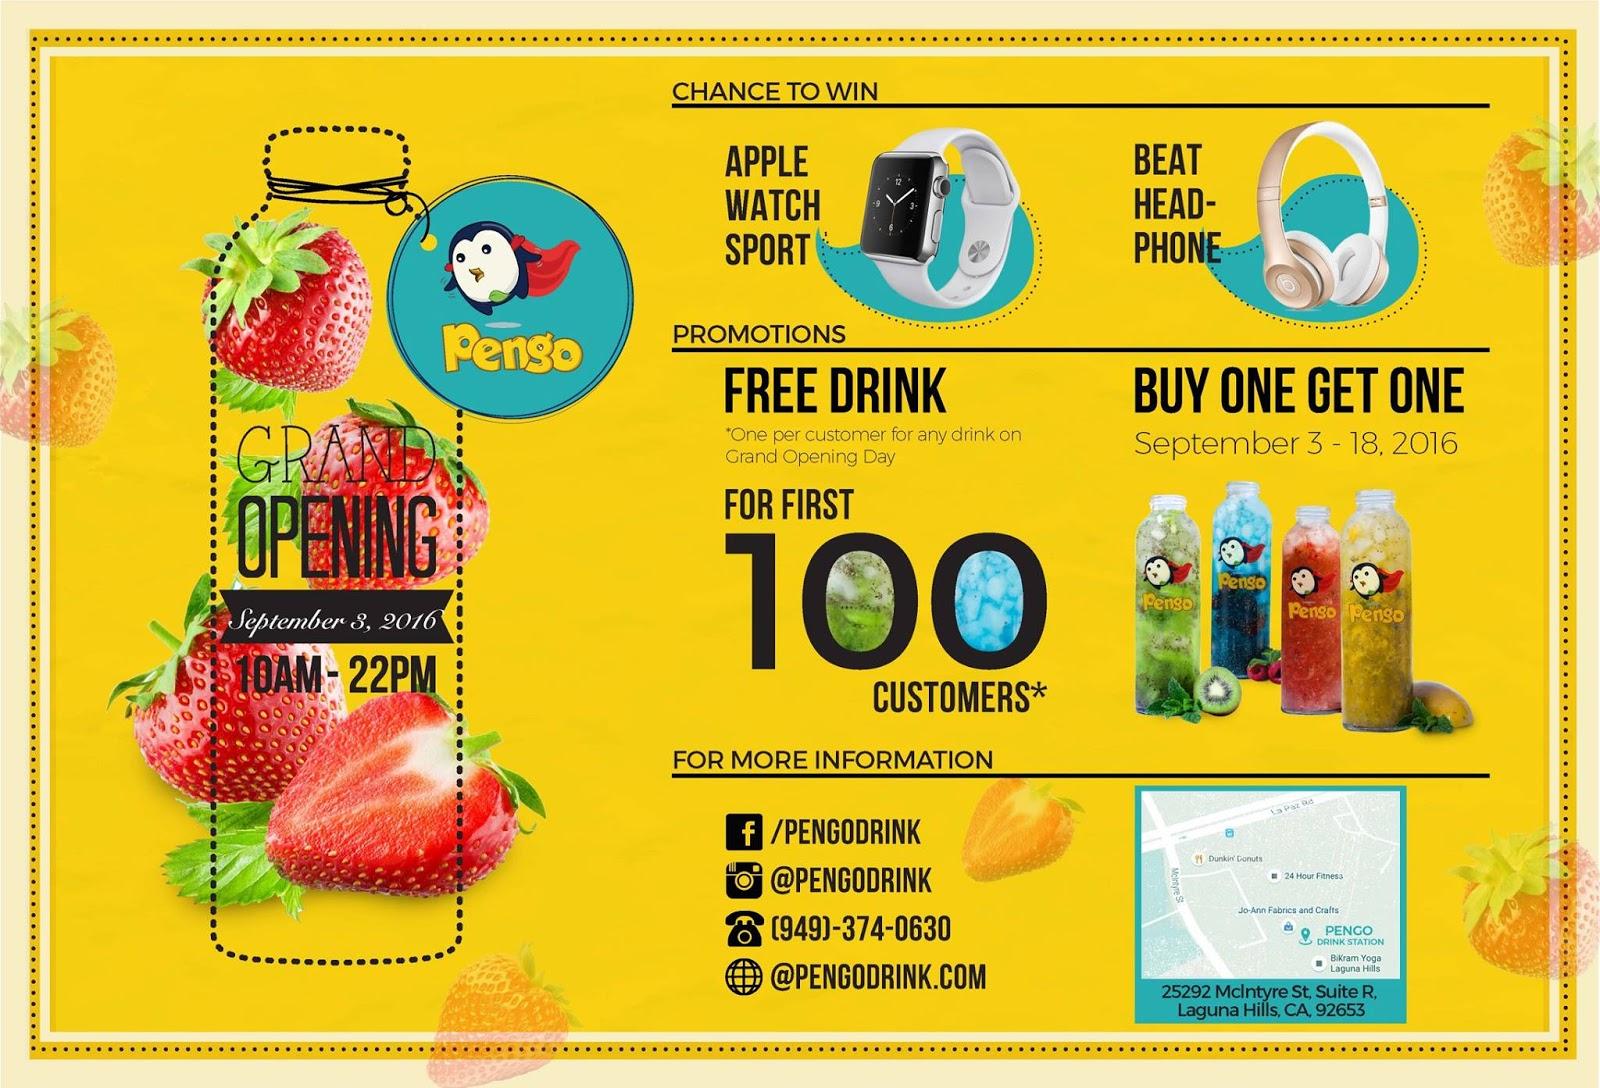 HQ Pengo Wallpapers | File 379.05Kb